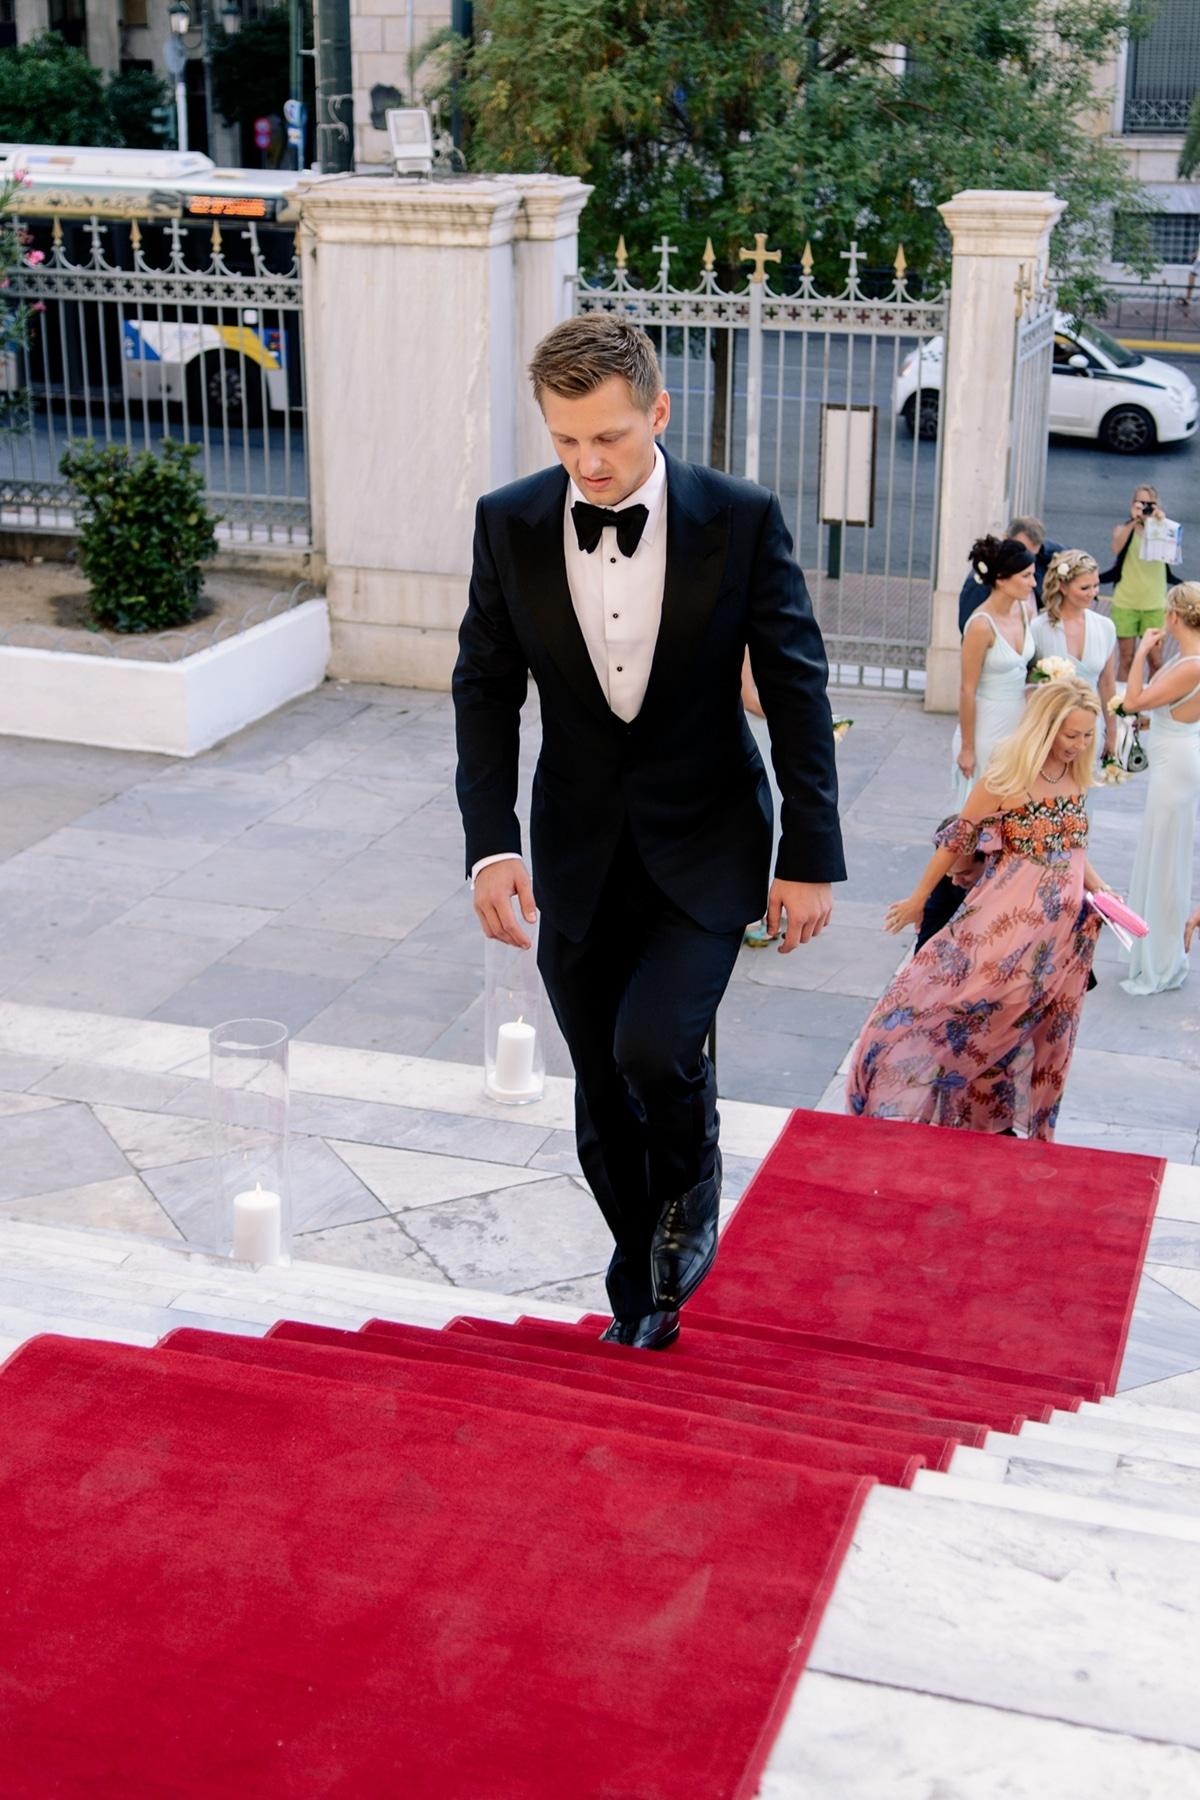 37424f16f19a Γκρι κοστούμι για το γαμπρό. Ρομαντικός elegant σικ γάμος στην Αθήνα